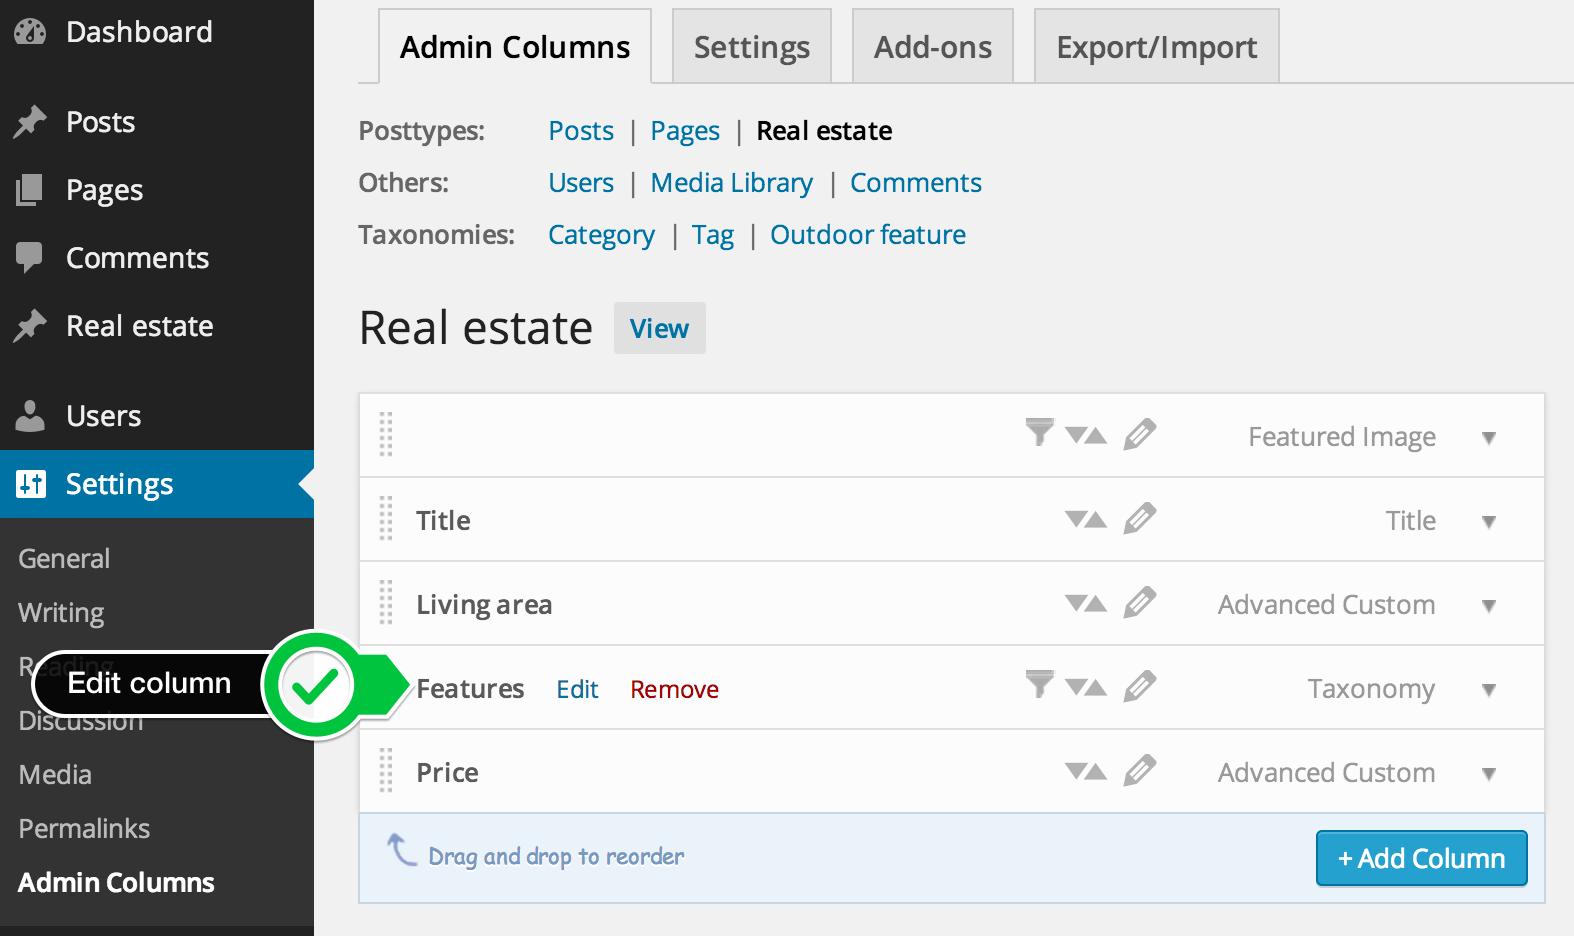 Admin-Columns-Settings---CodePress-Admin-Columns---WordPress